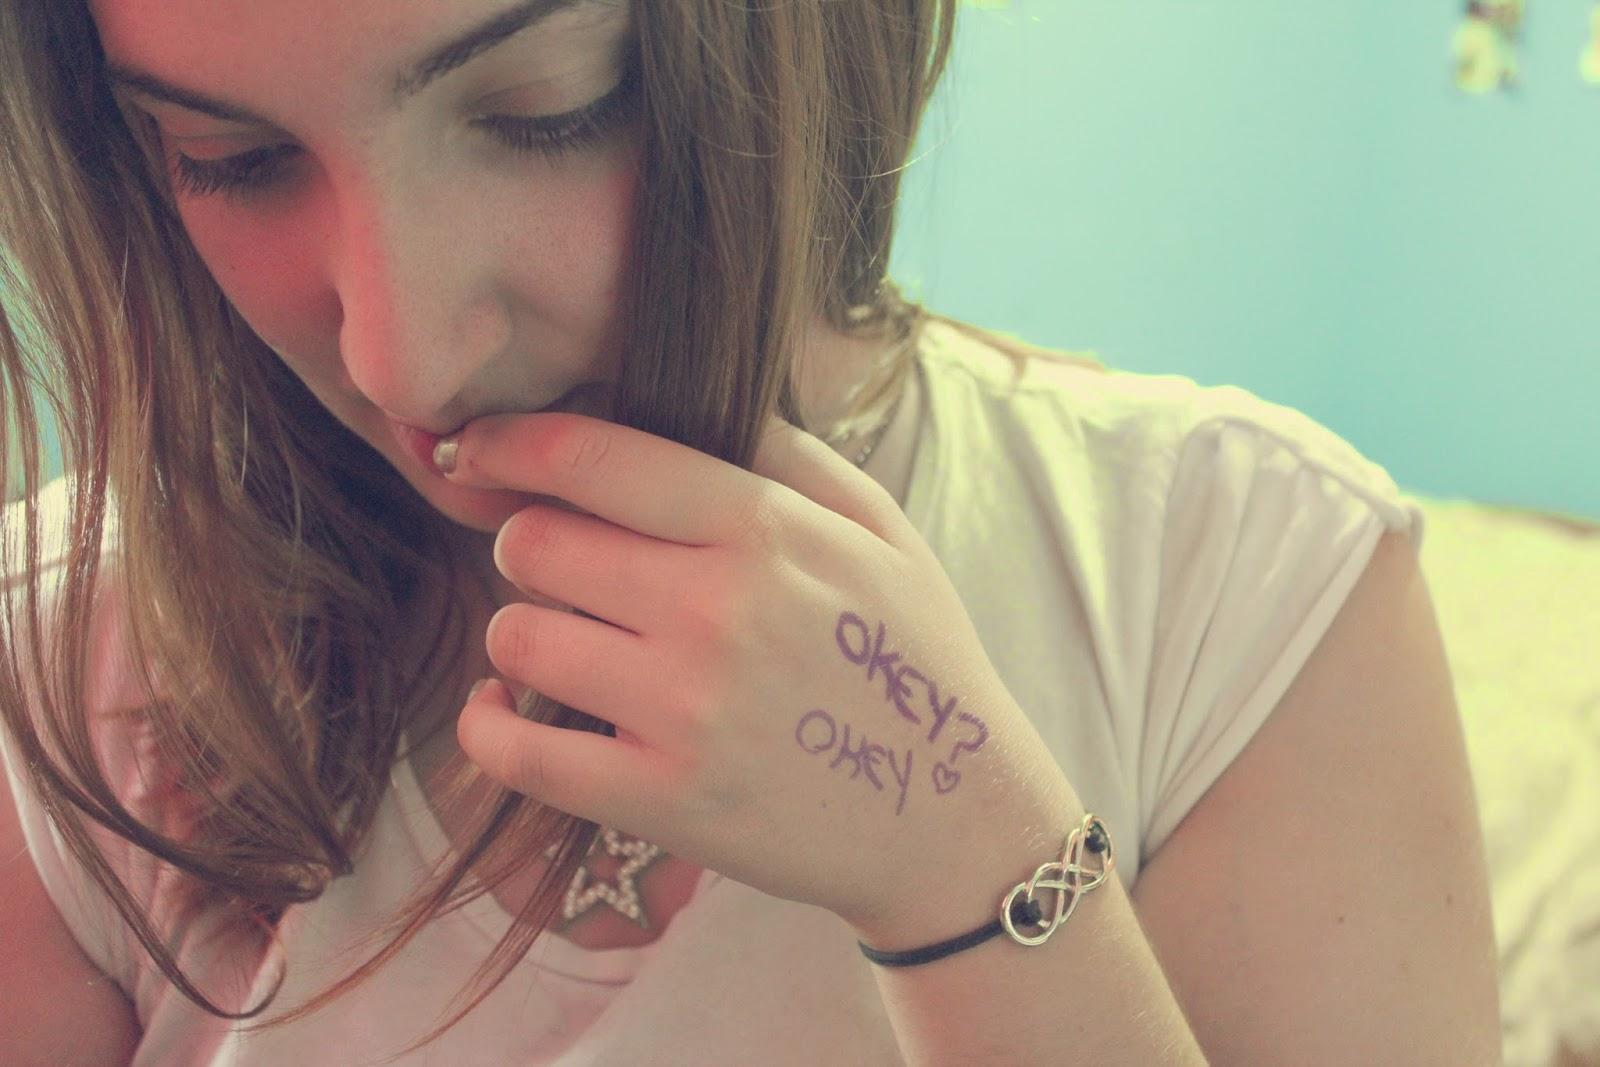 Okey ? Okey.